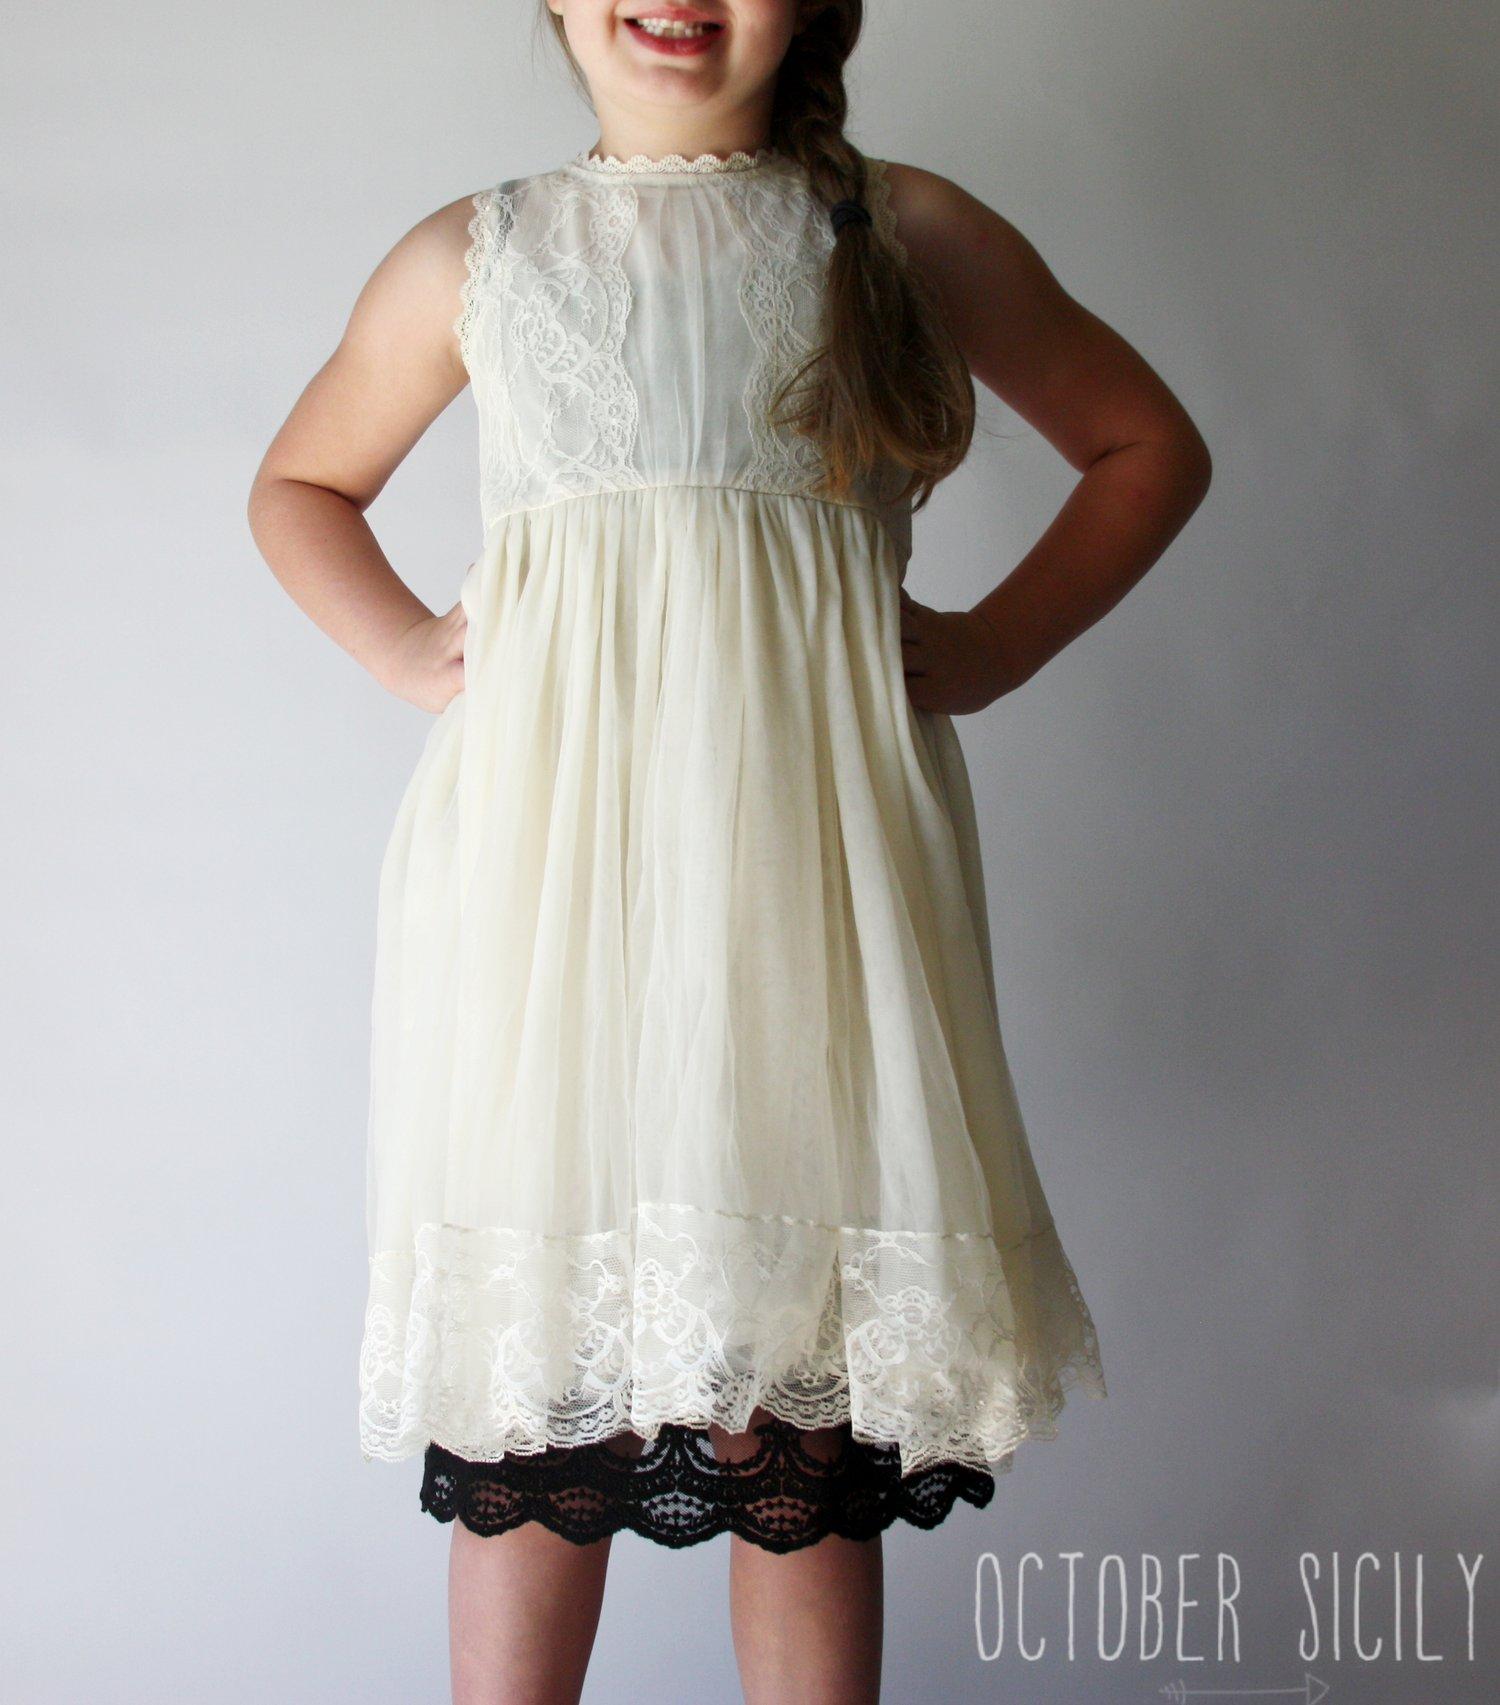 Image of FREESHIP Girls Full Slip Lace Dress Extender, Size 6-12 years